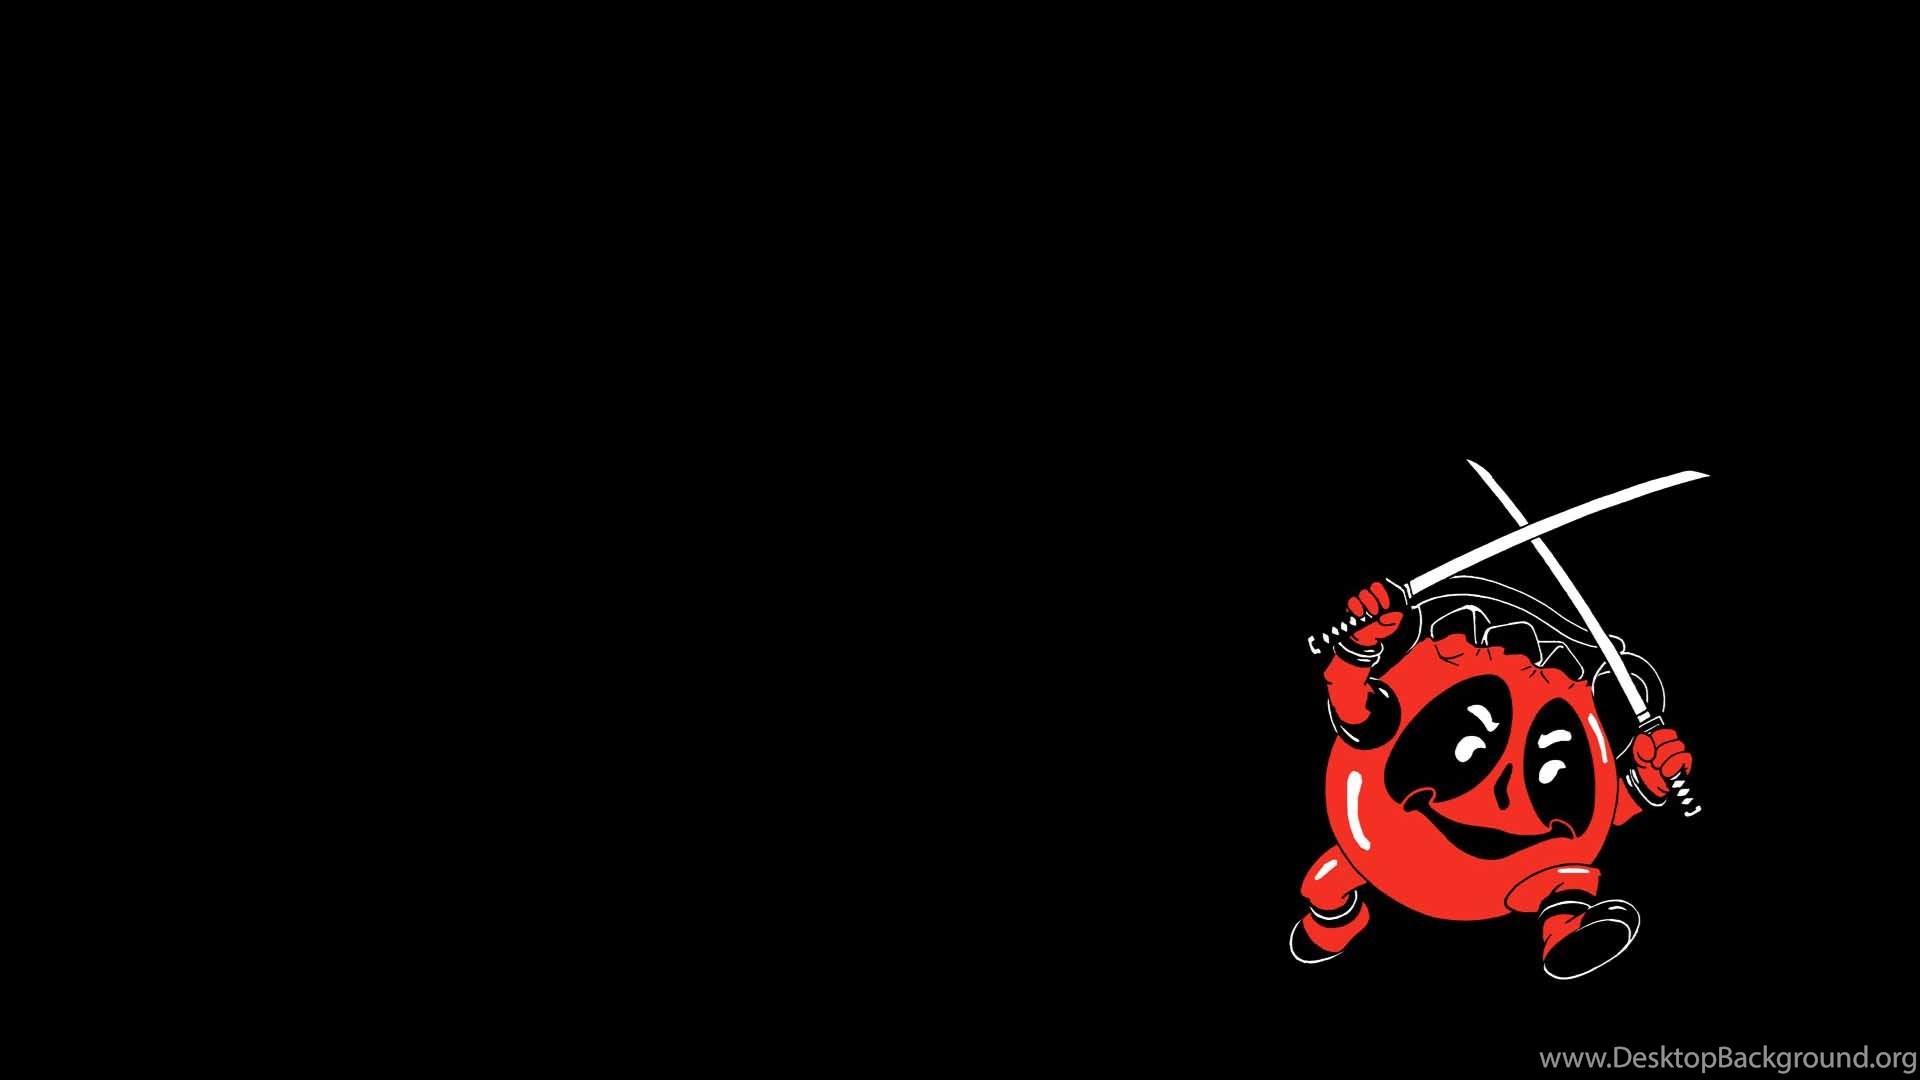 673 Deadpool Hd Wallpapers Desktop Background